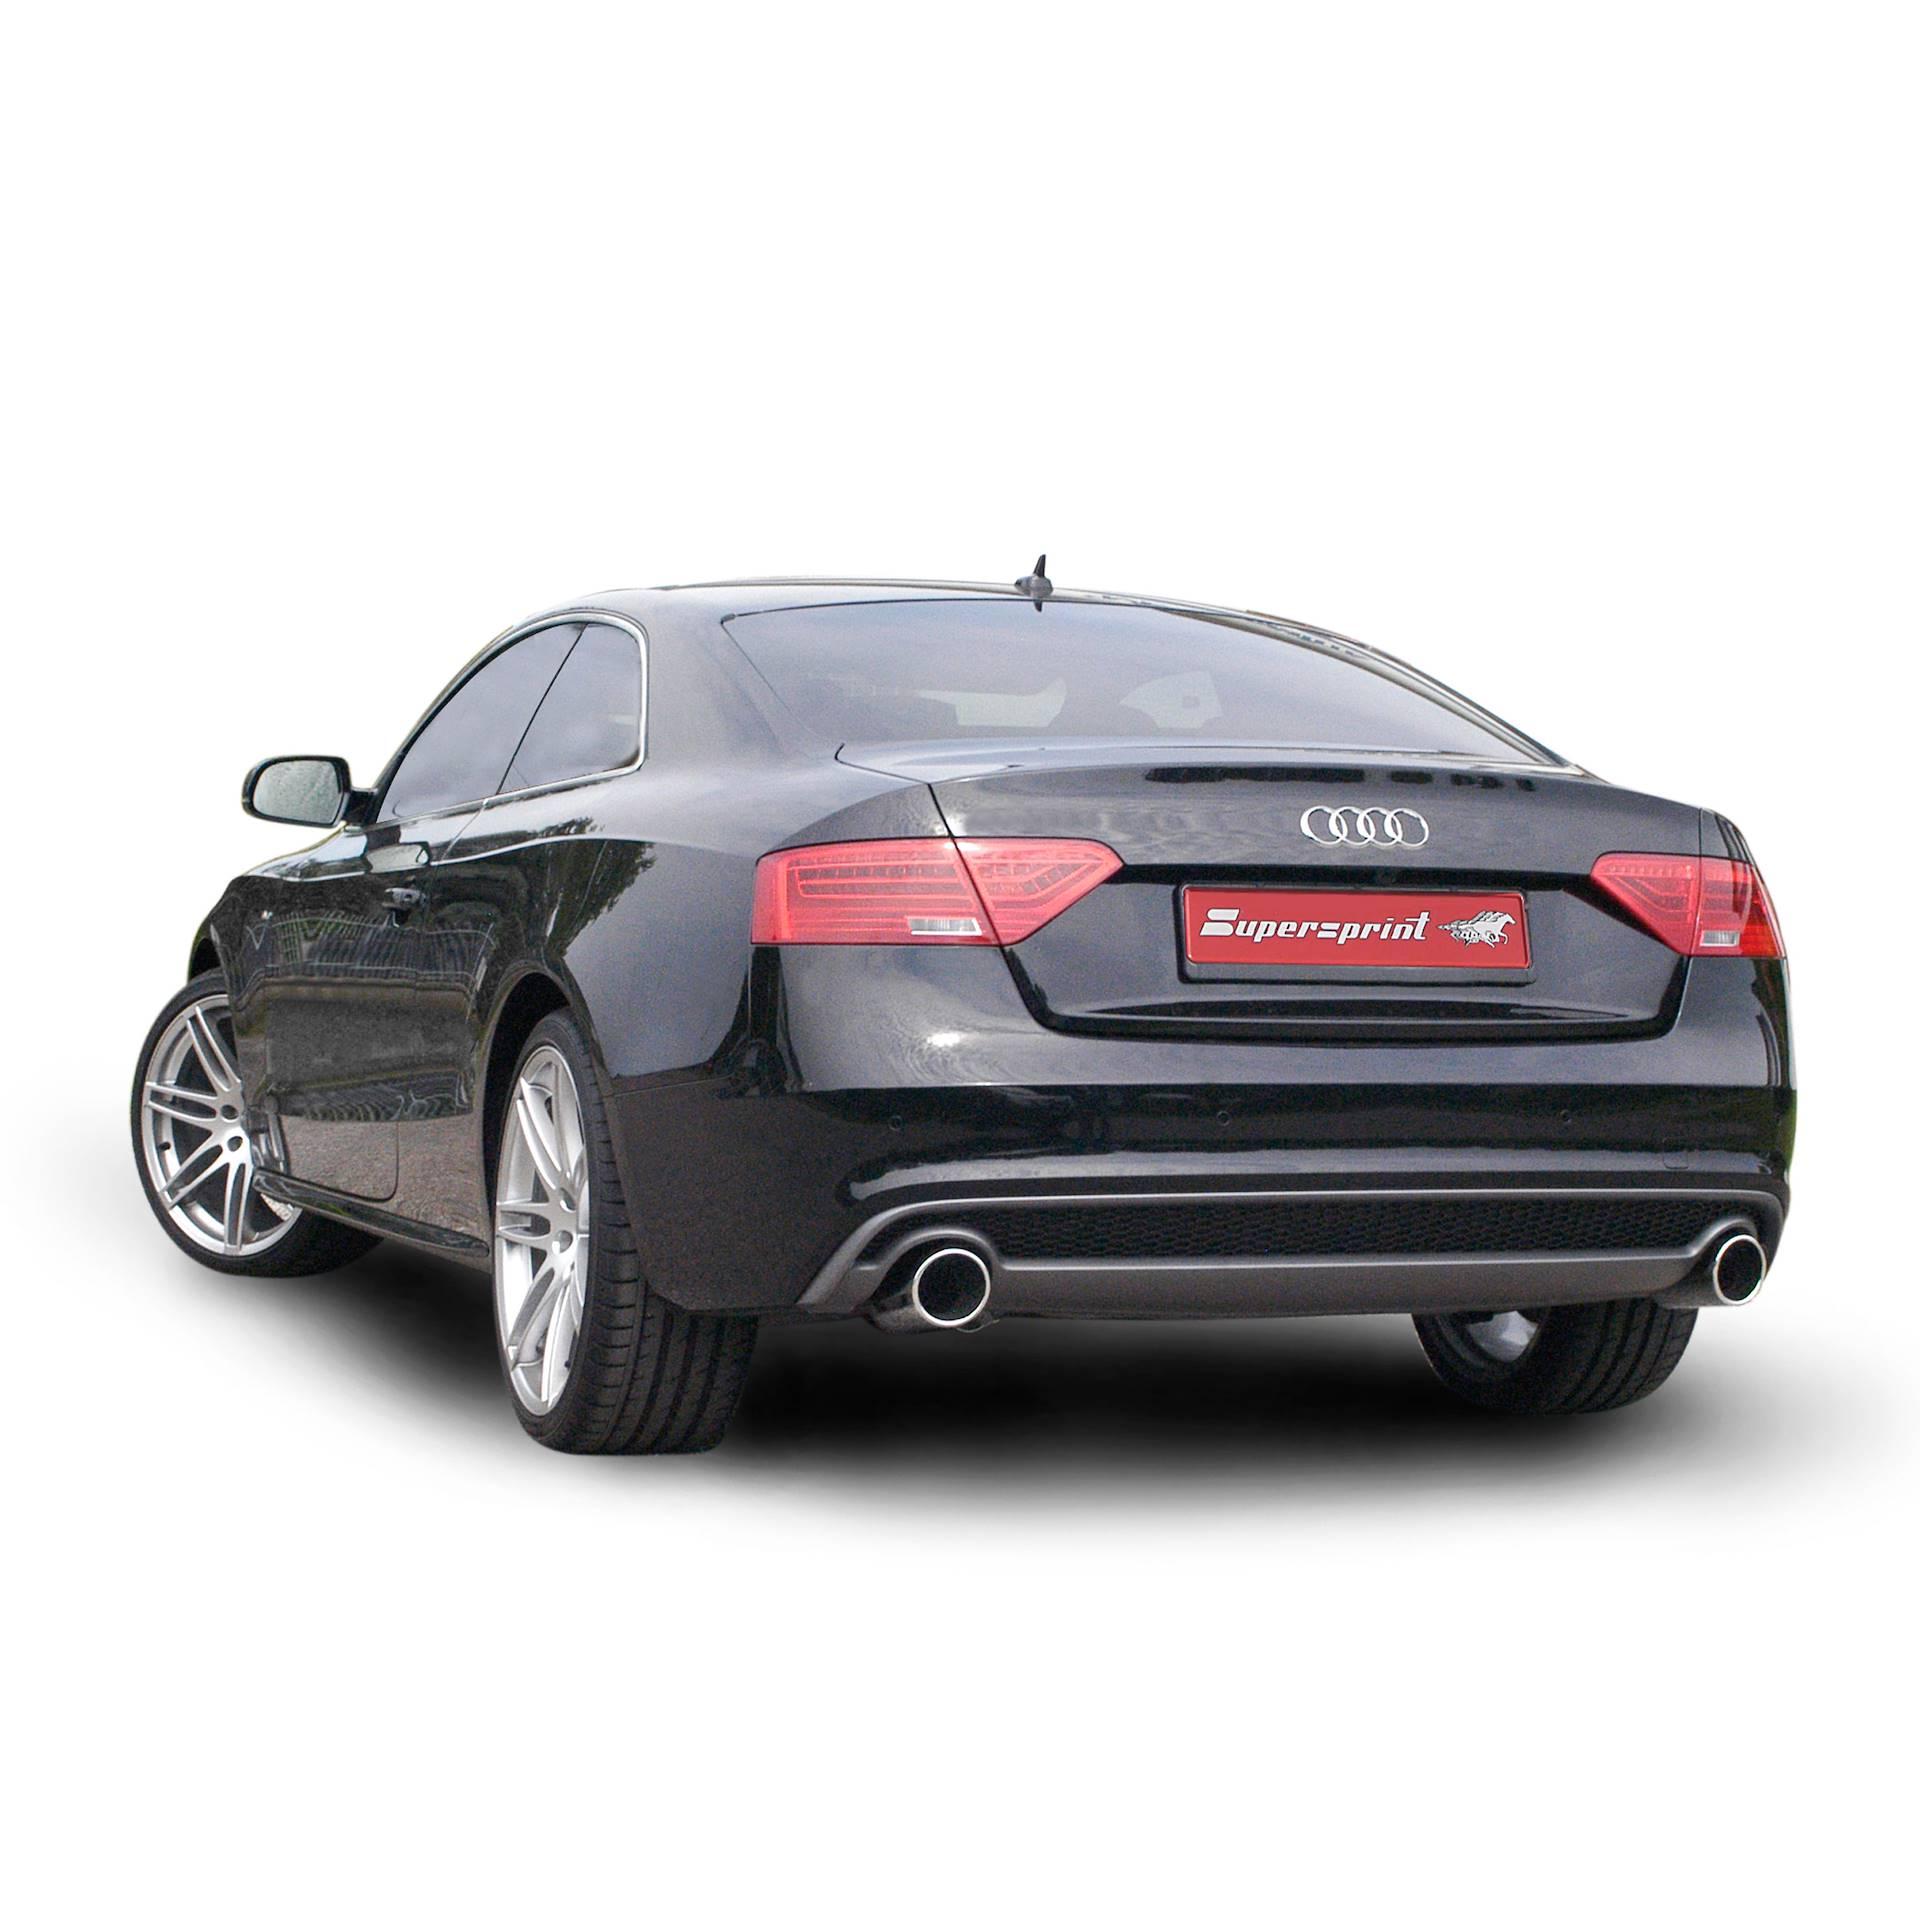 audi a5 coup cabrio 1 8 tfsi 160 170 177 hp 39 08. Black Bedroom Furniture Sets. Home Design Ideas